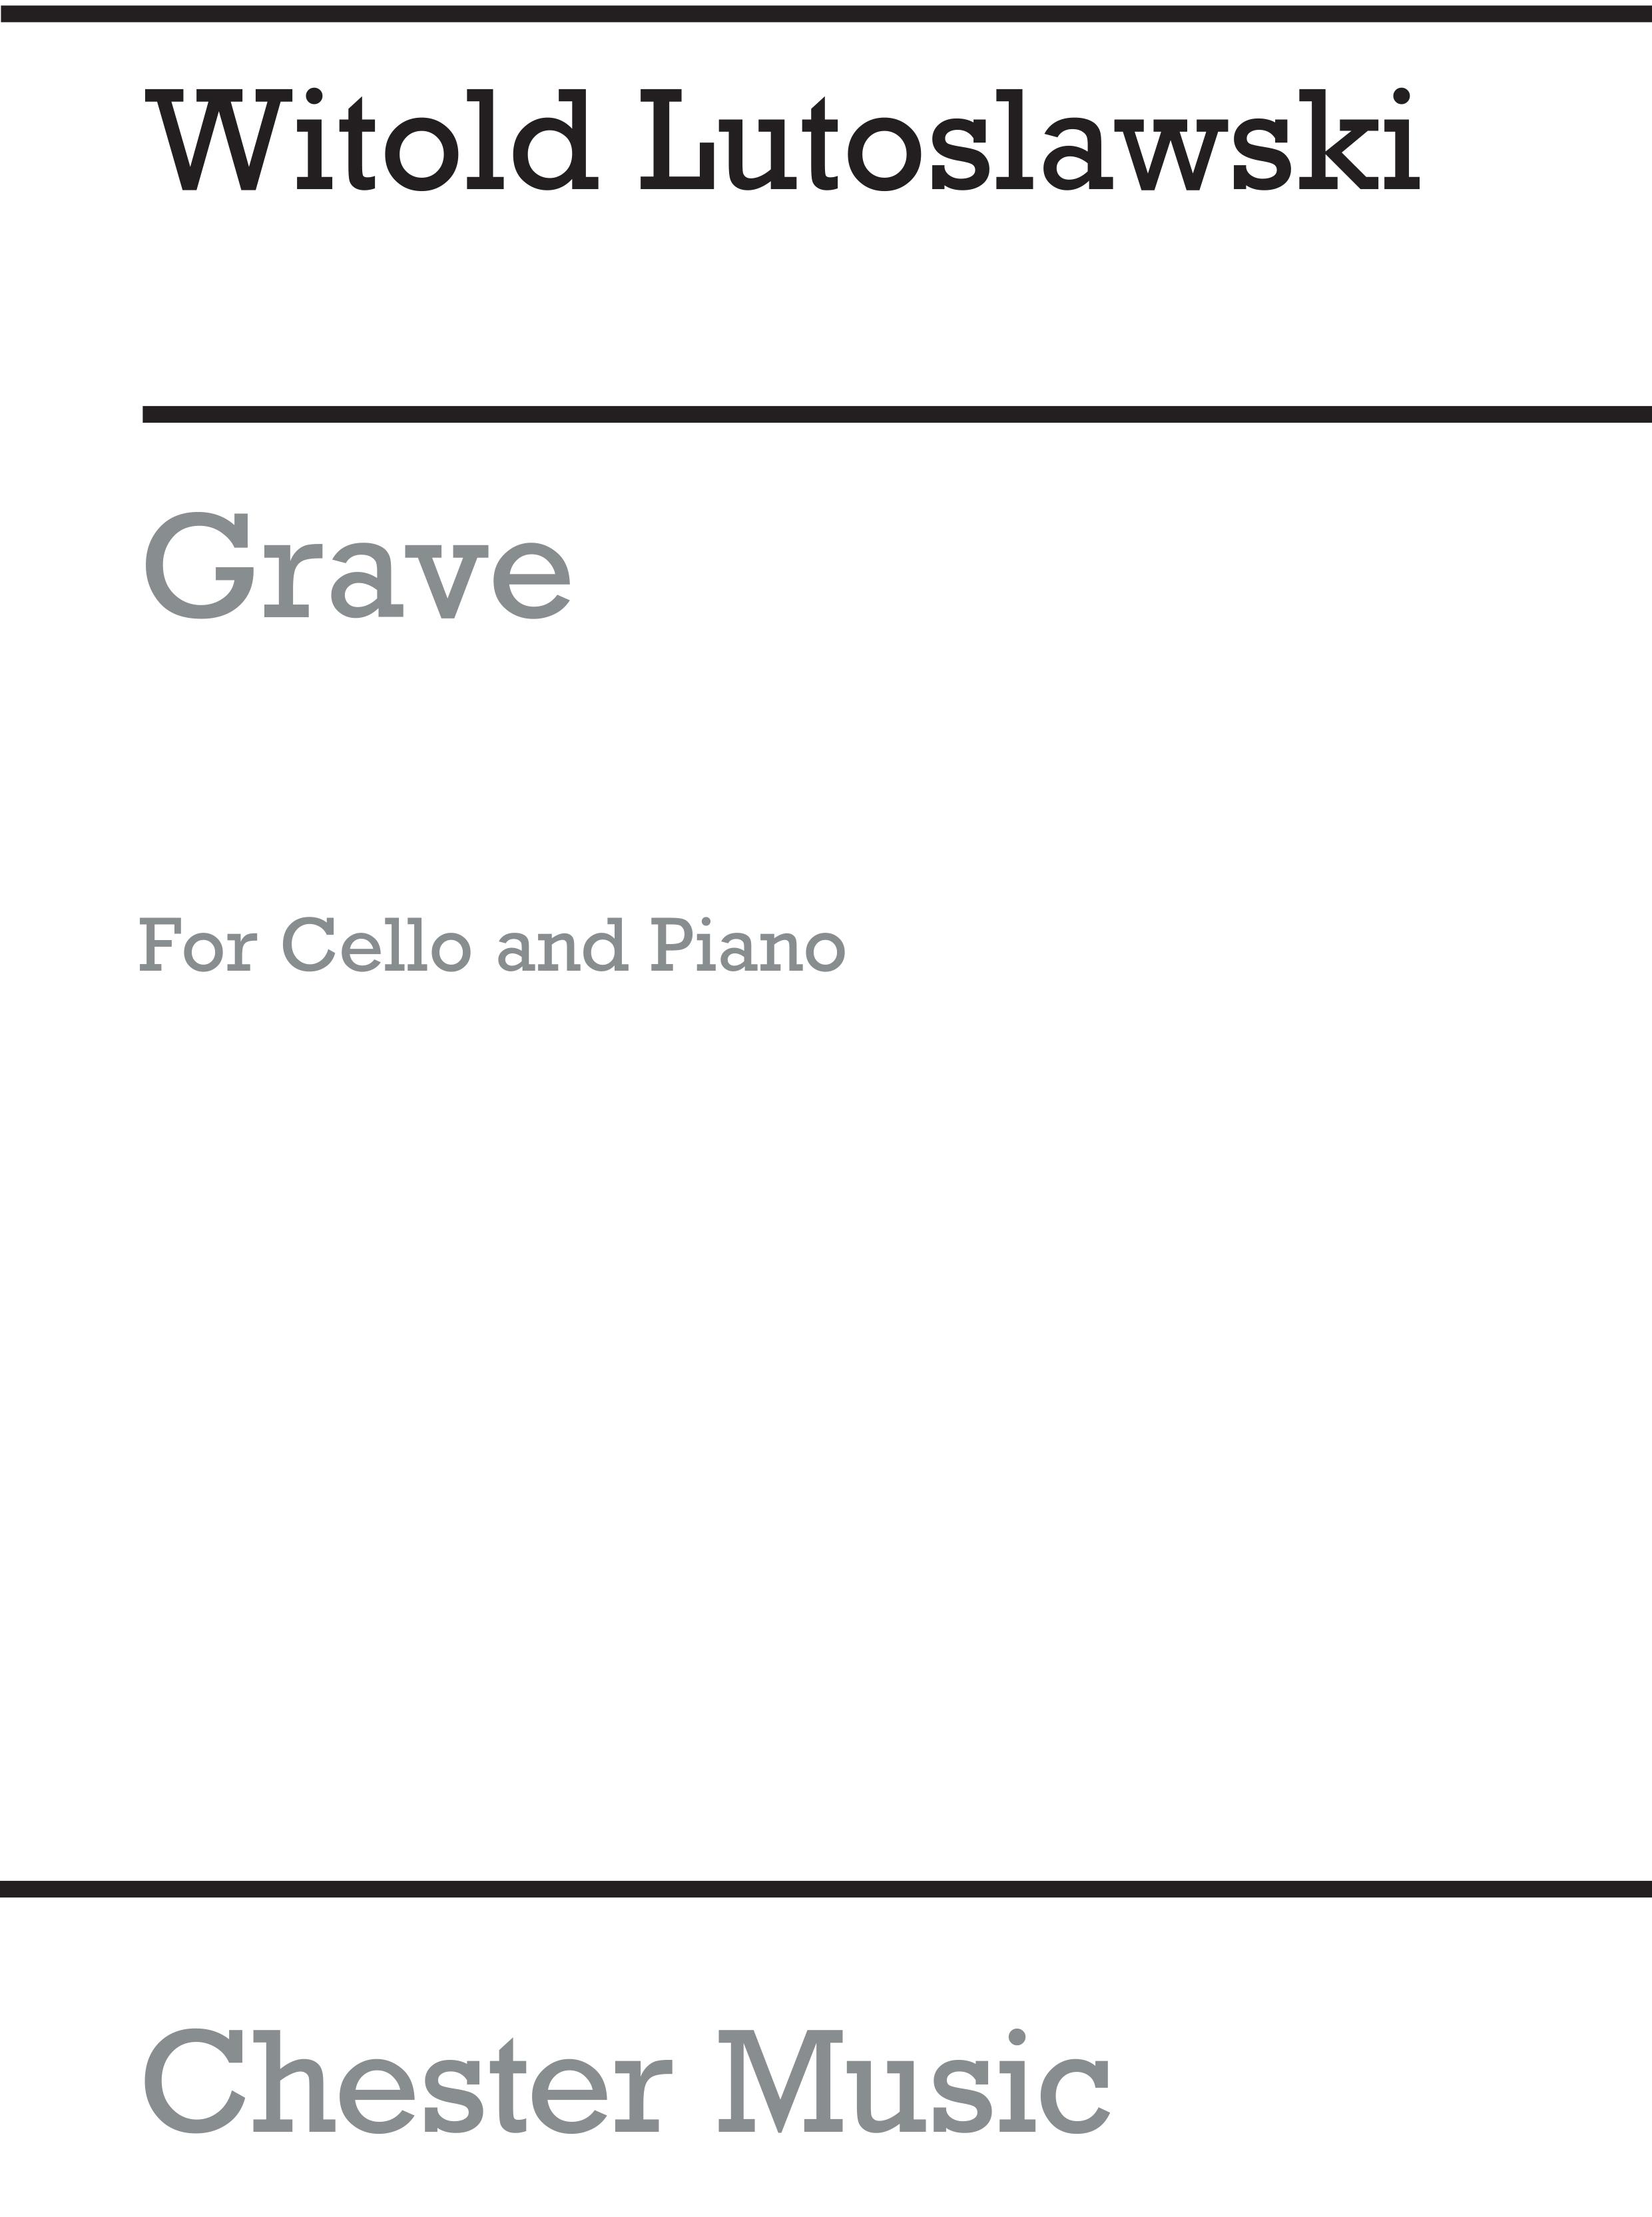 Witold Lutoslawski: Grave For Cello And Piano: Cello: Instrumental Work